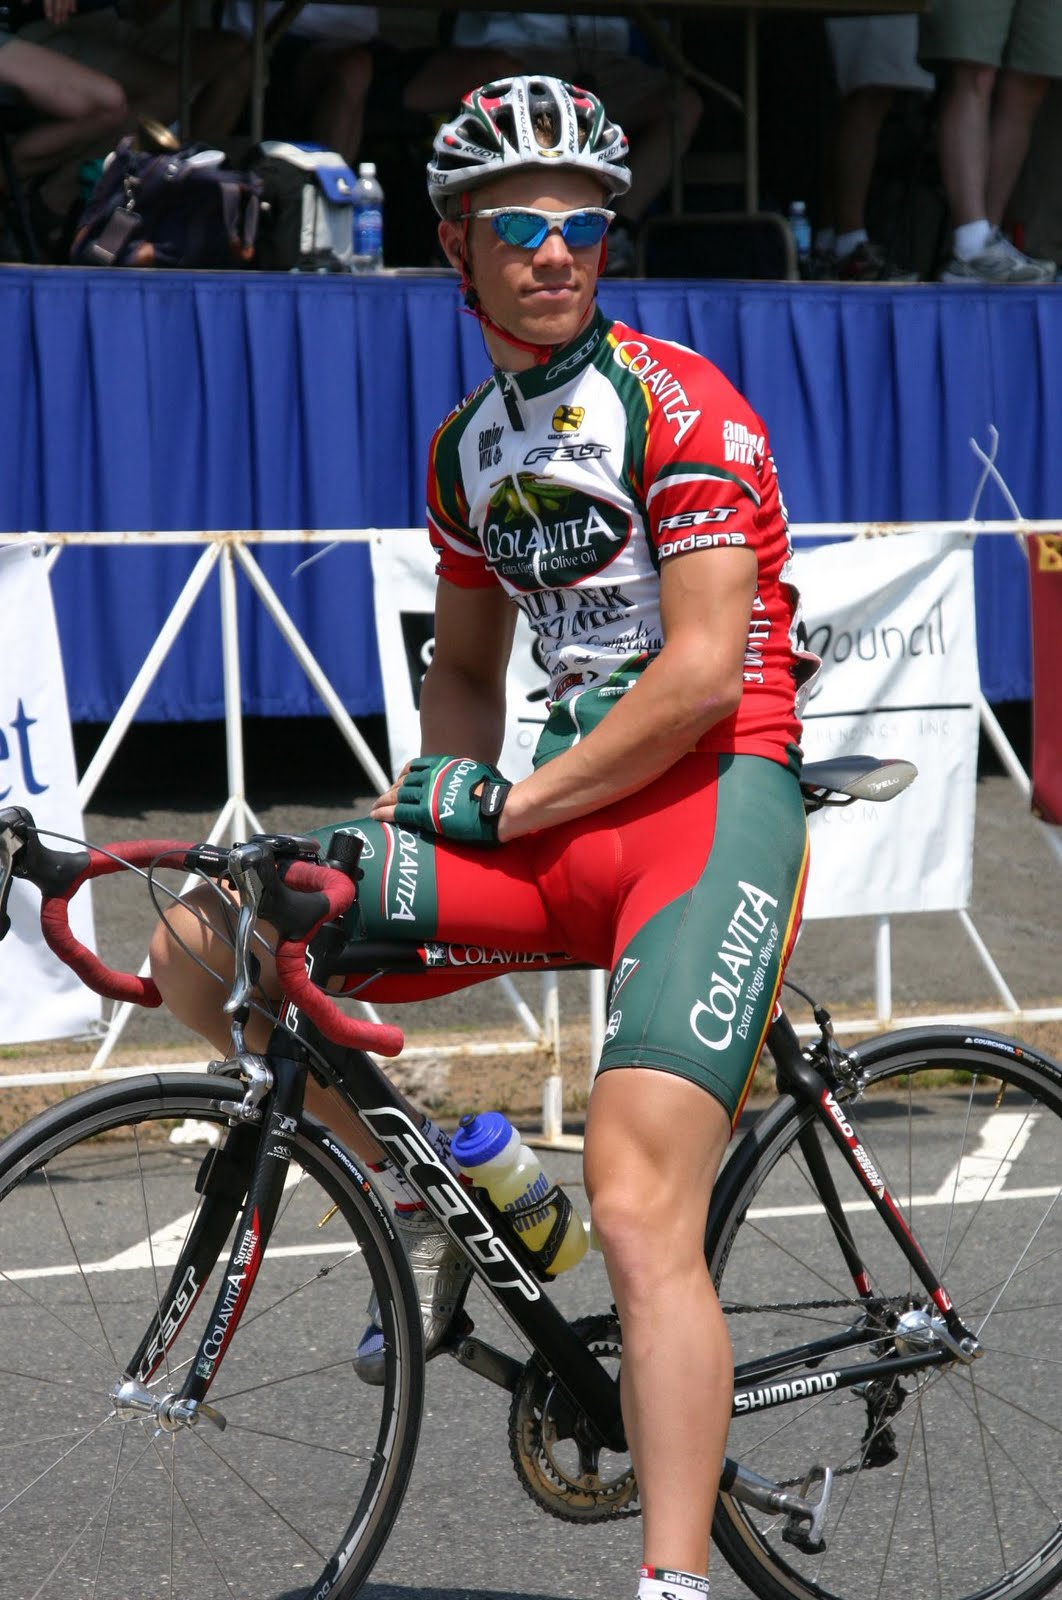 Male cyclist bulge